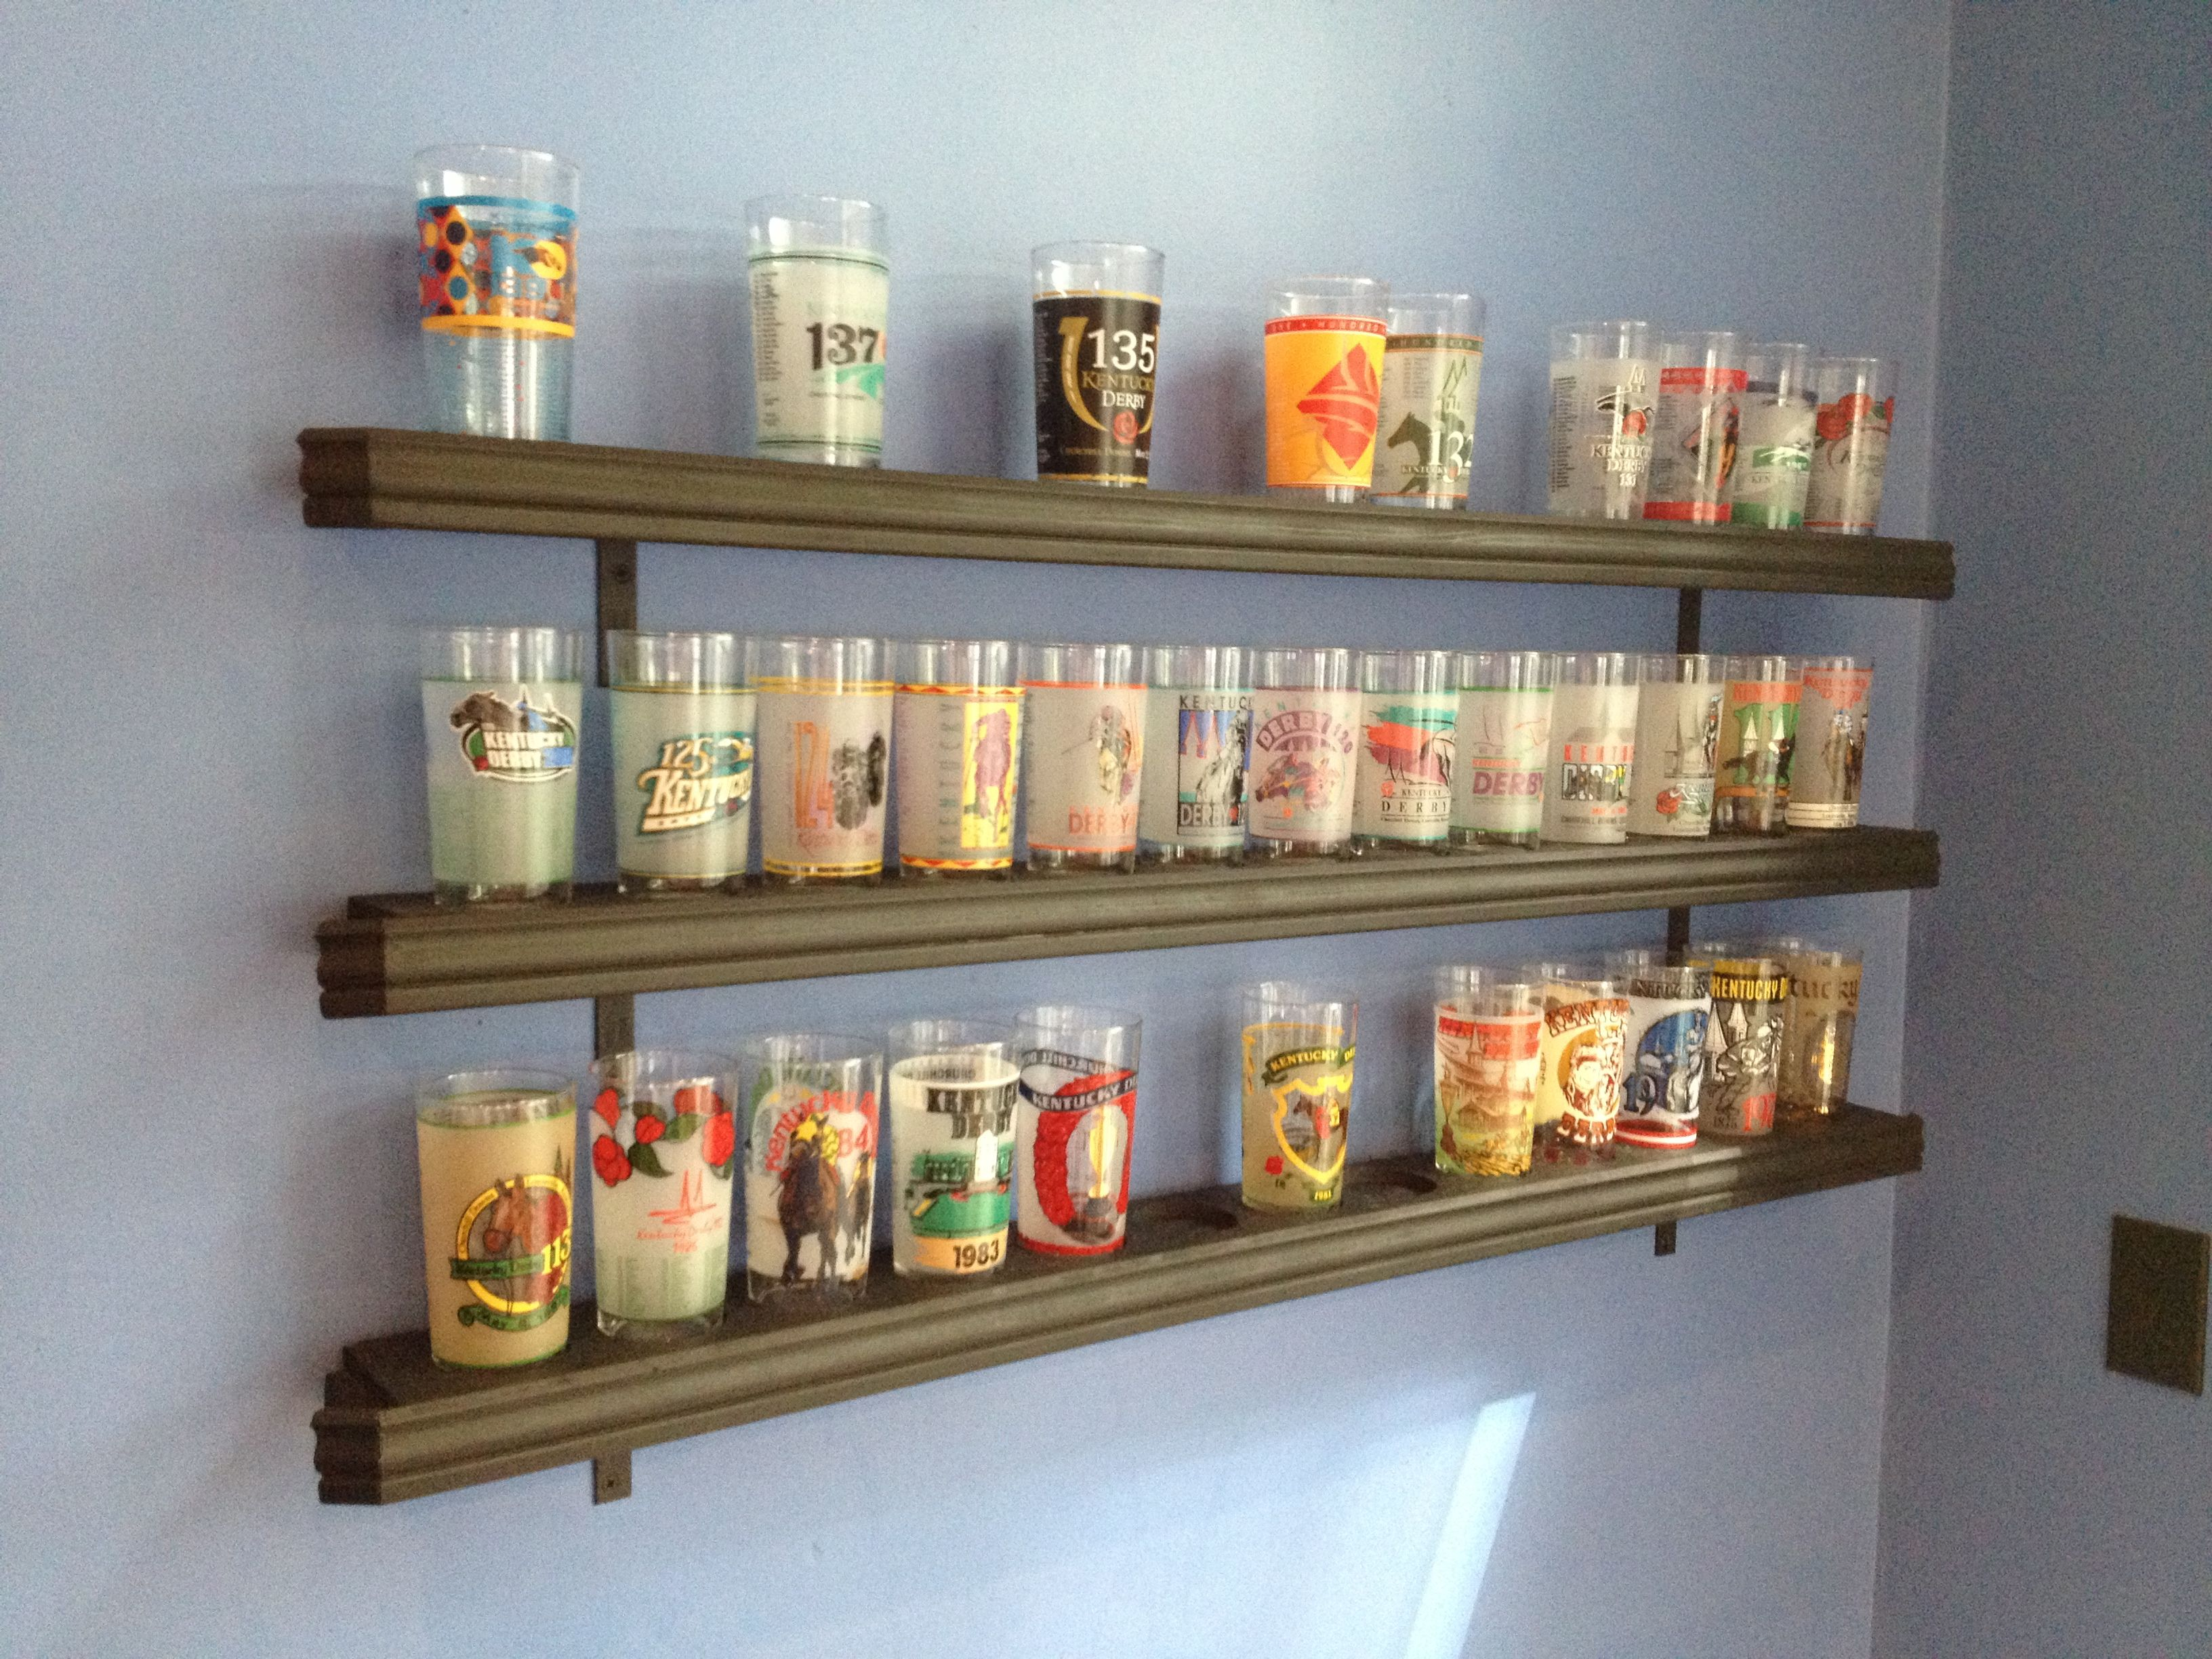 Derby Glass Display Shelves: My boyfriend made these shelves to display  Kentucky Derby glasses he